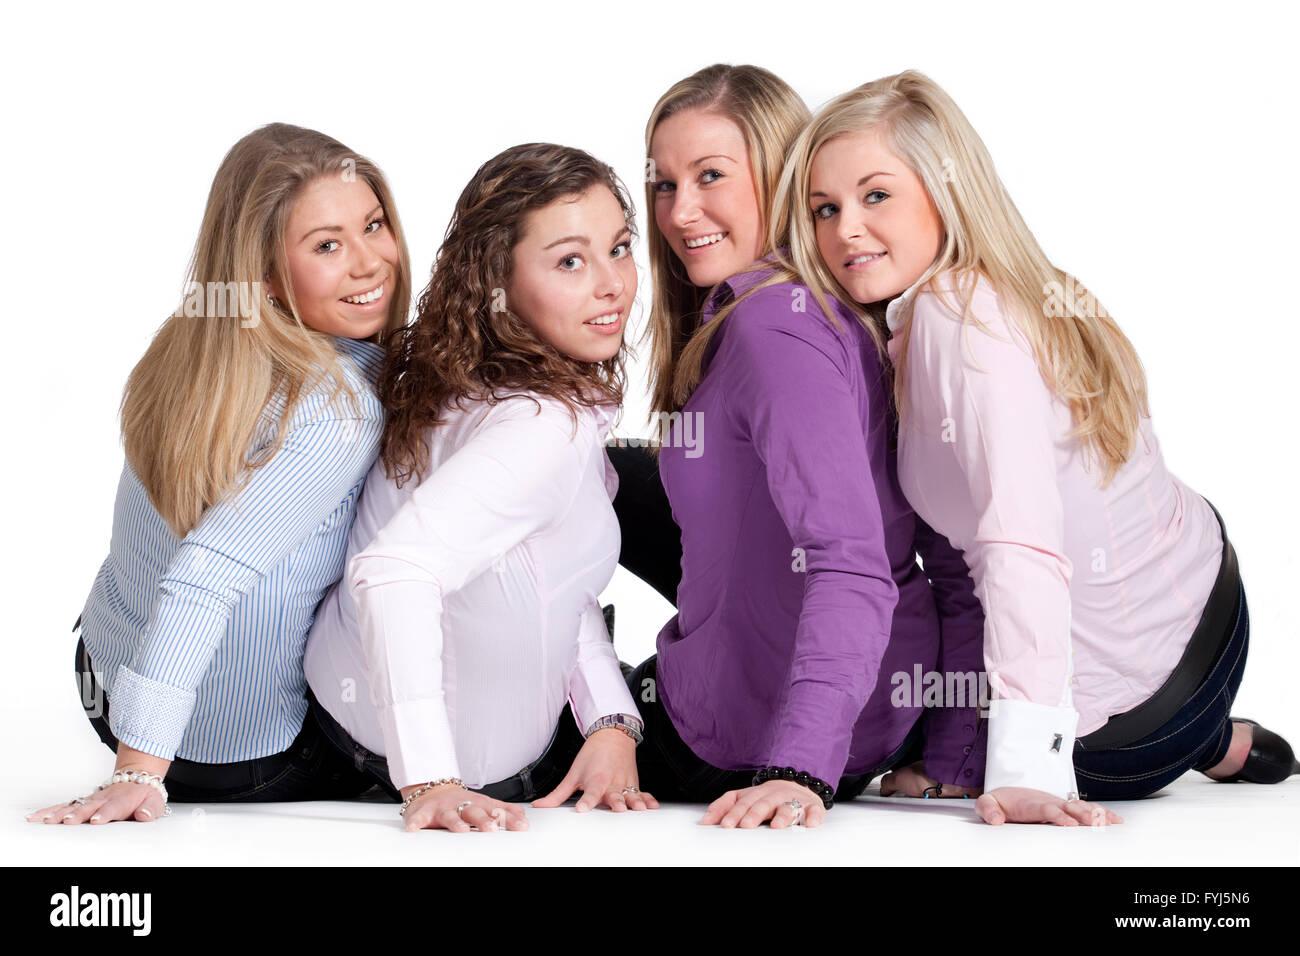 Happy girly group - Stock Image